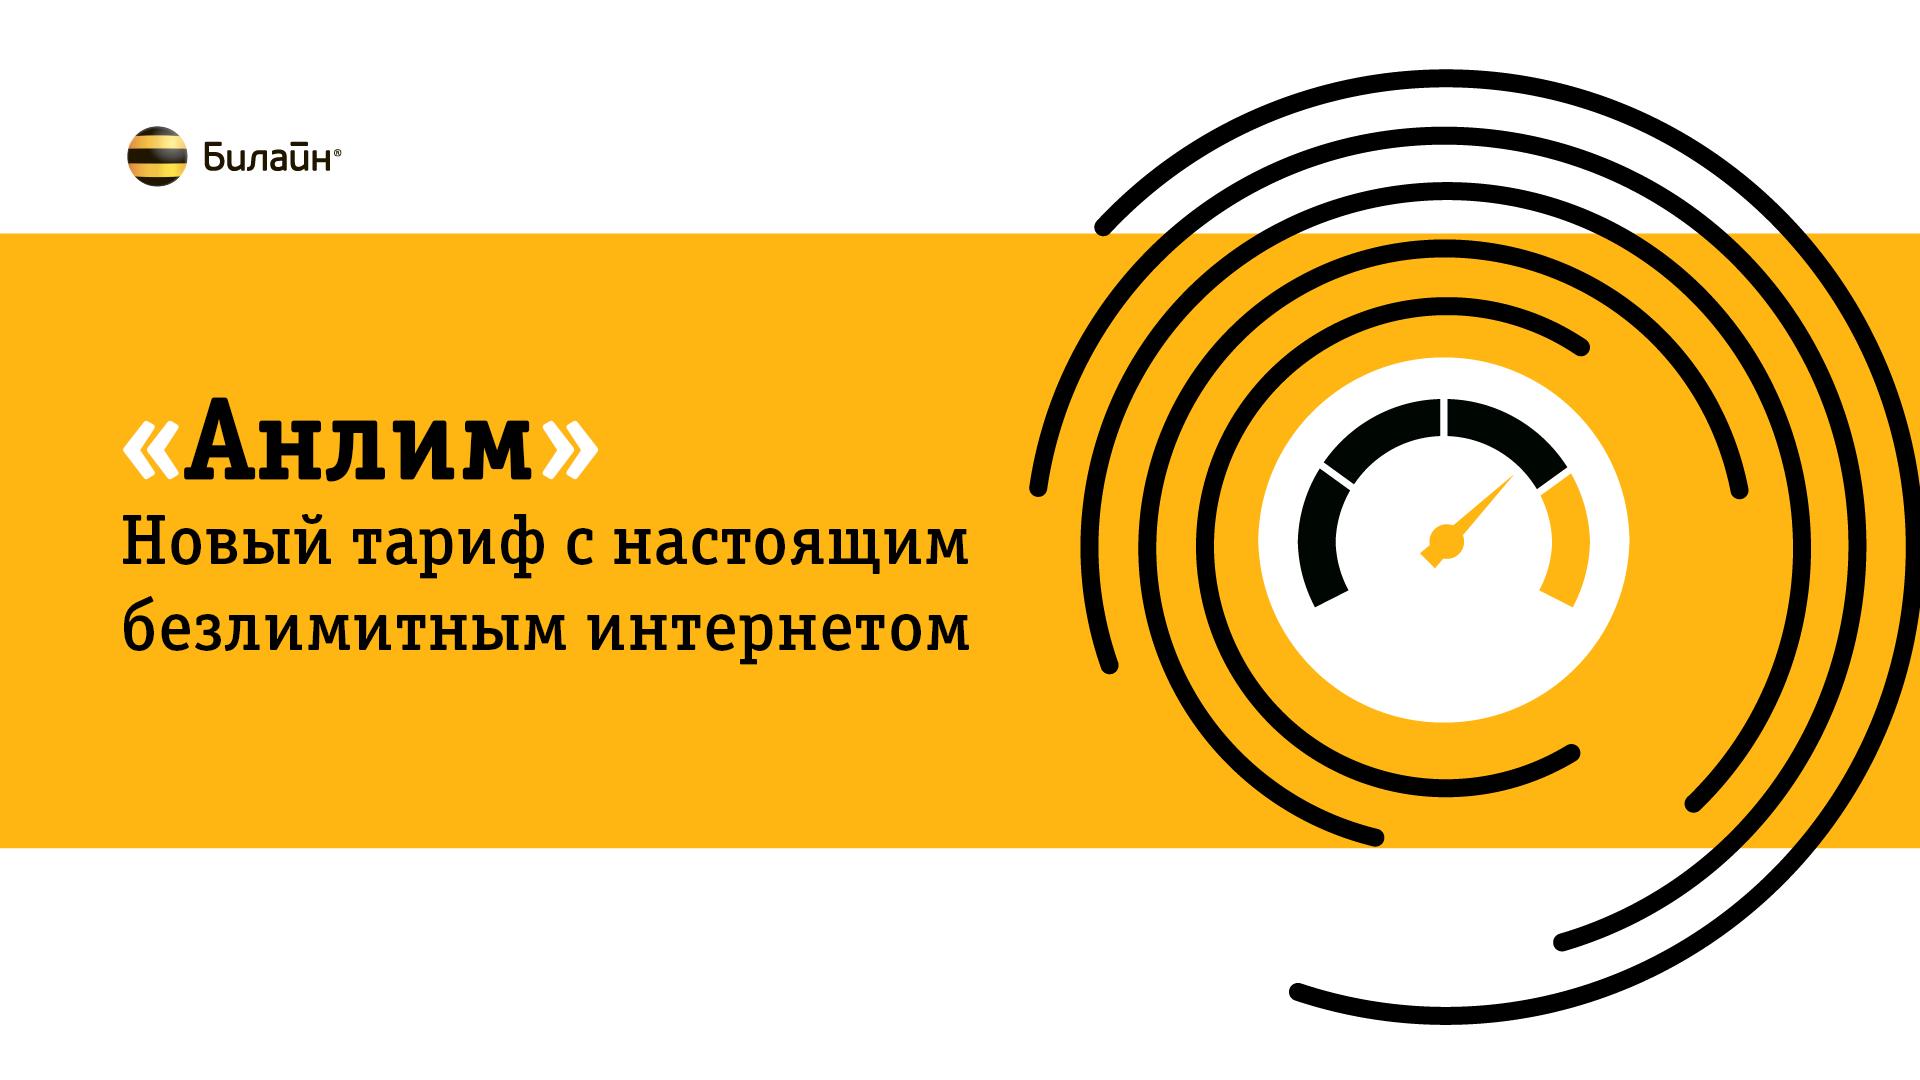 «Анлим» - новый тариф с безграничным интернетом от Билайн 1